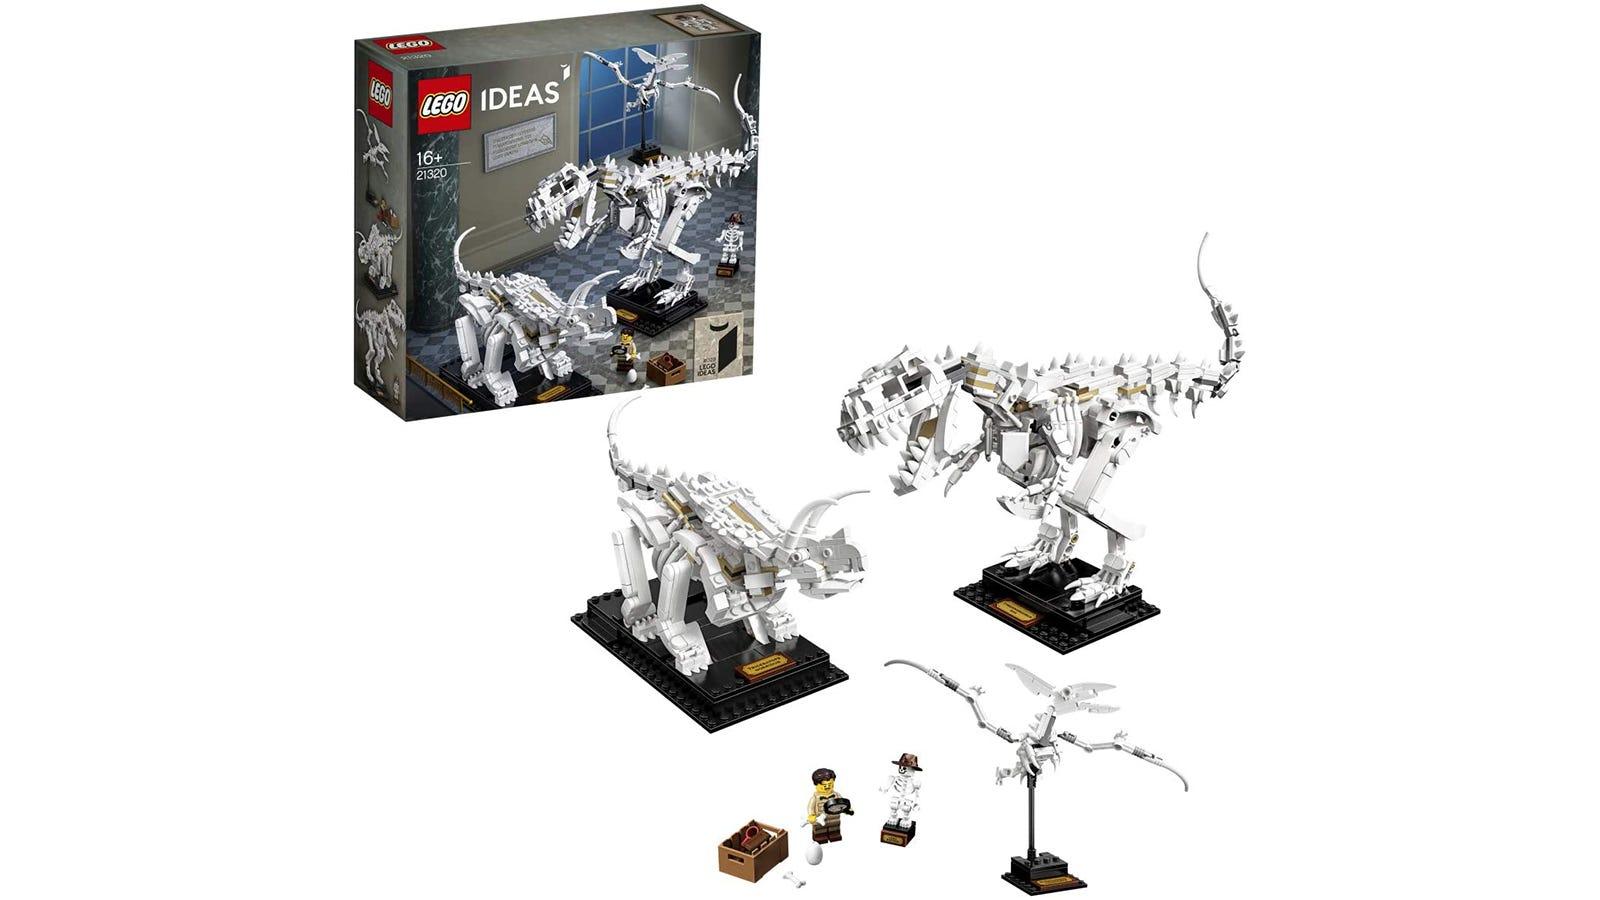 LEGO Ideas Dinosaur Fossils